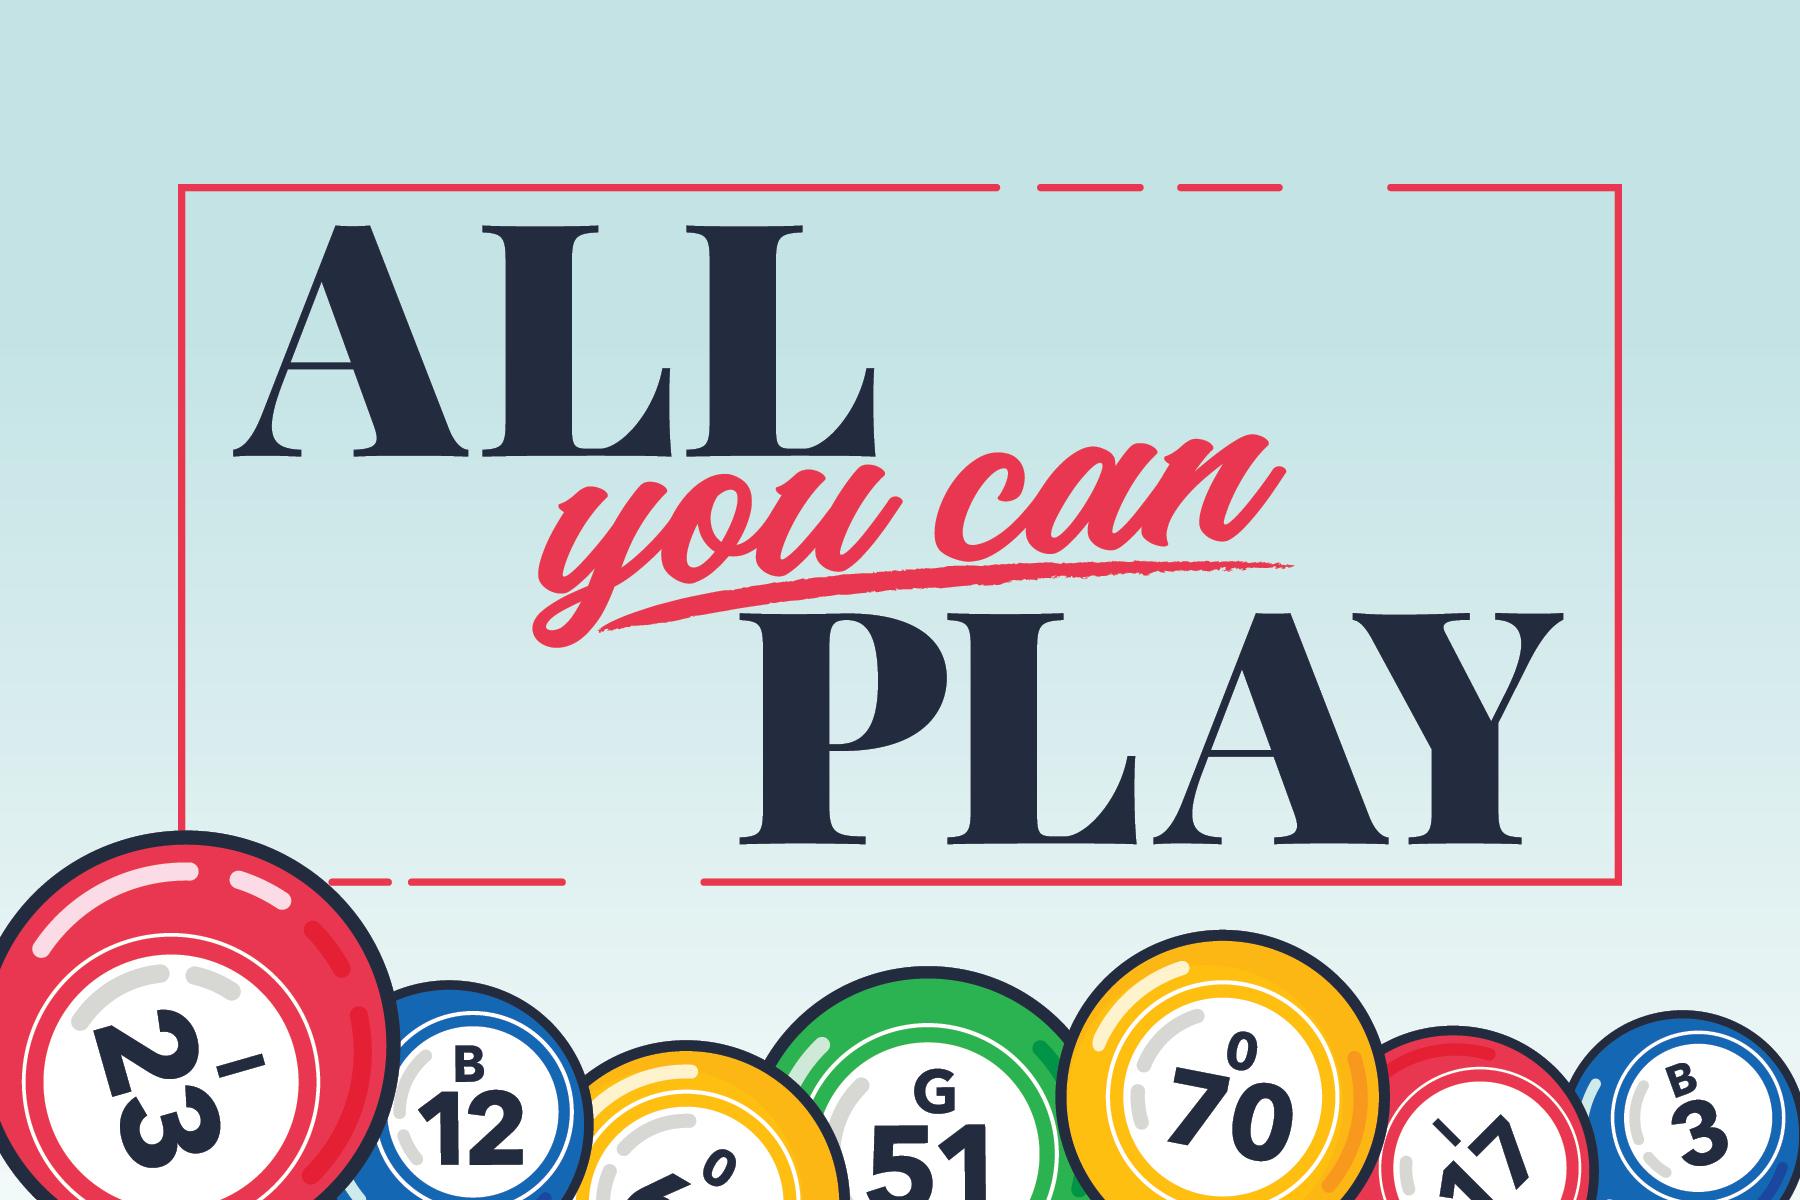 Casino Promotions | Turning Stone Resort Casino within Turning Stone Casino Bingo Prices